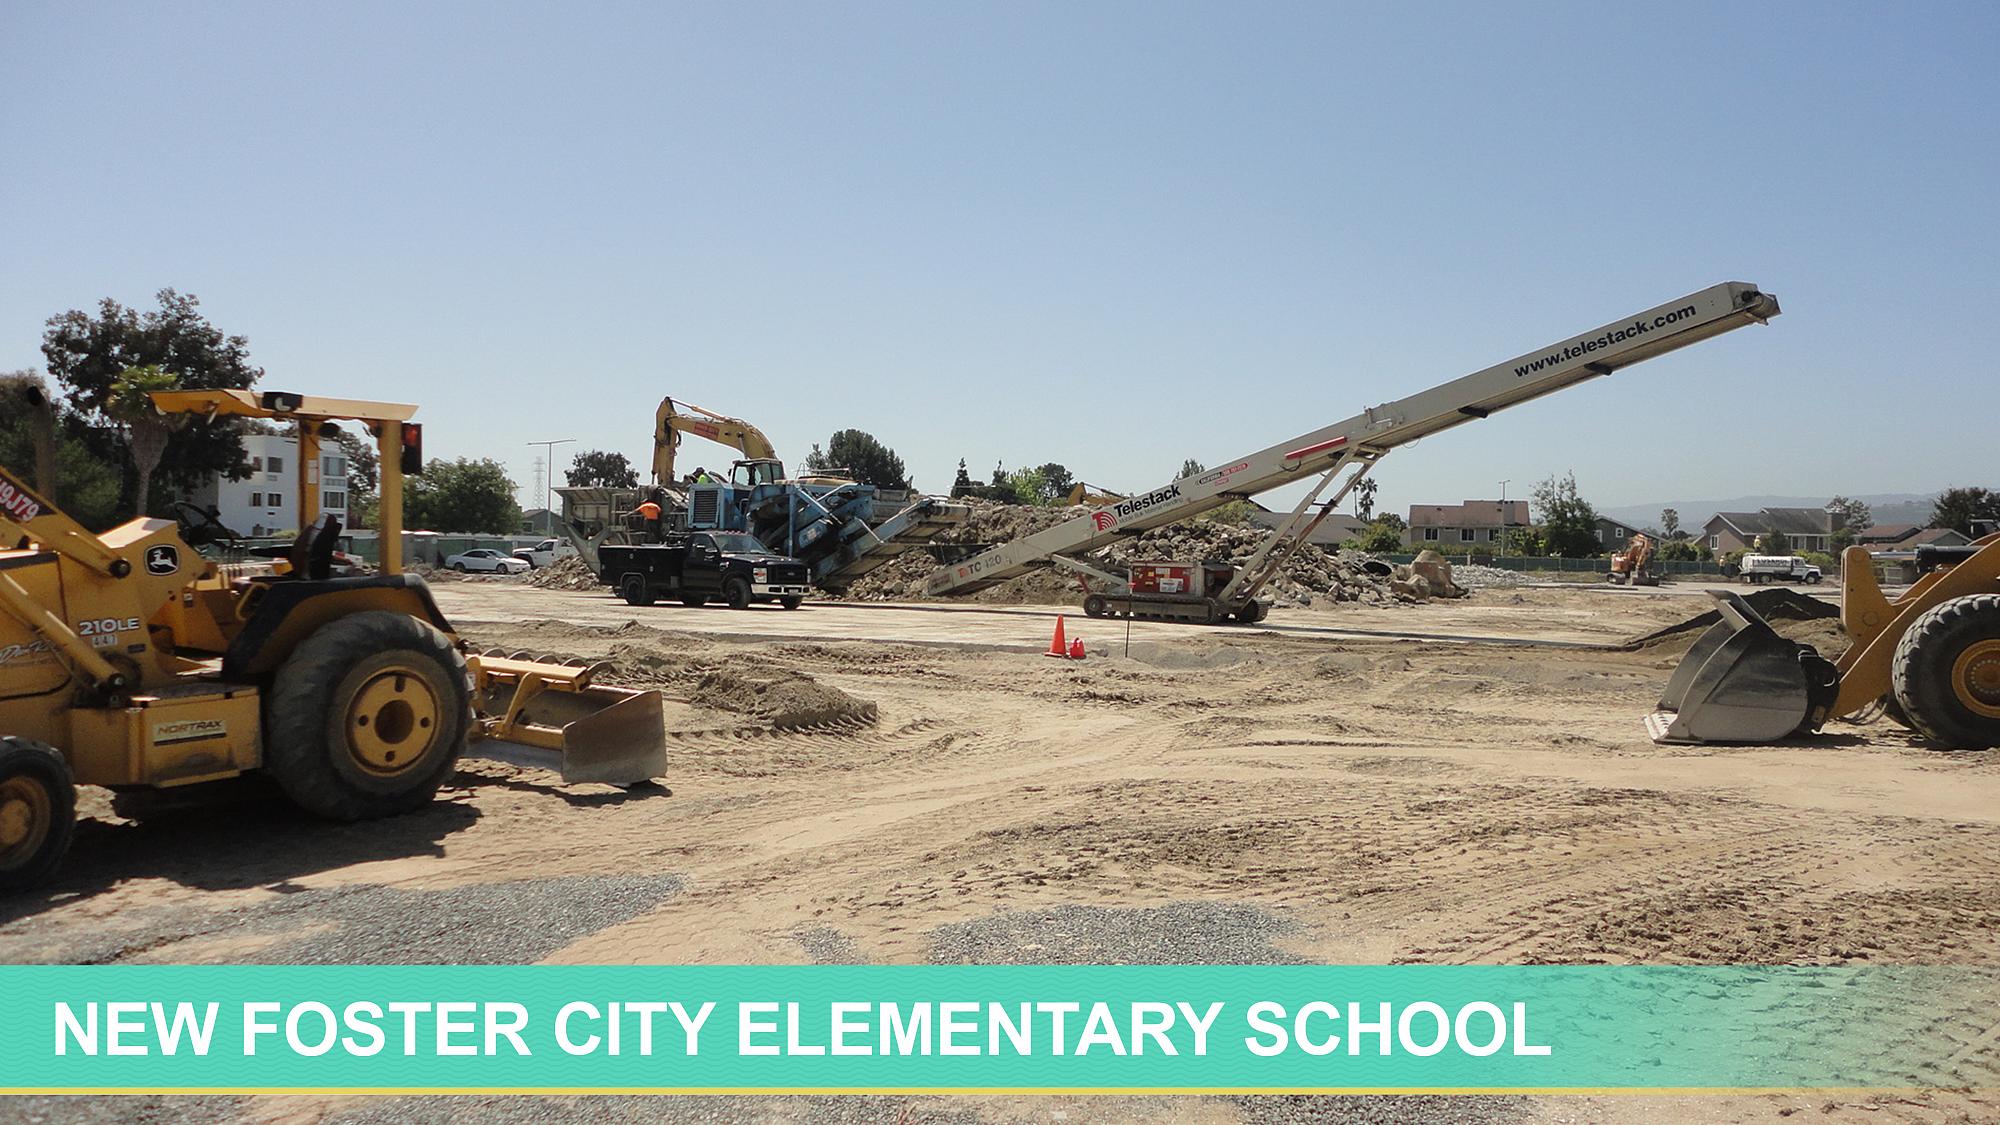 San Mateo Foster City School District – Foster City New Pertaining To Audubon Calendars 2021 Foster City